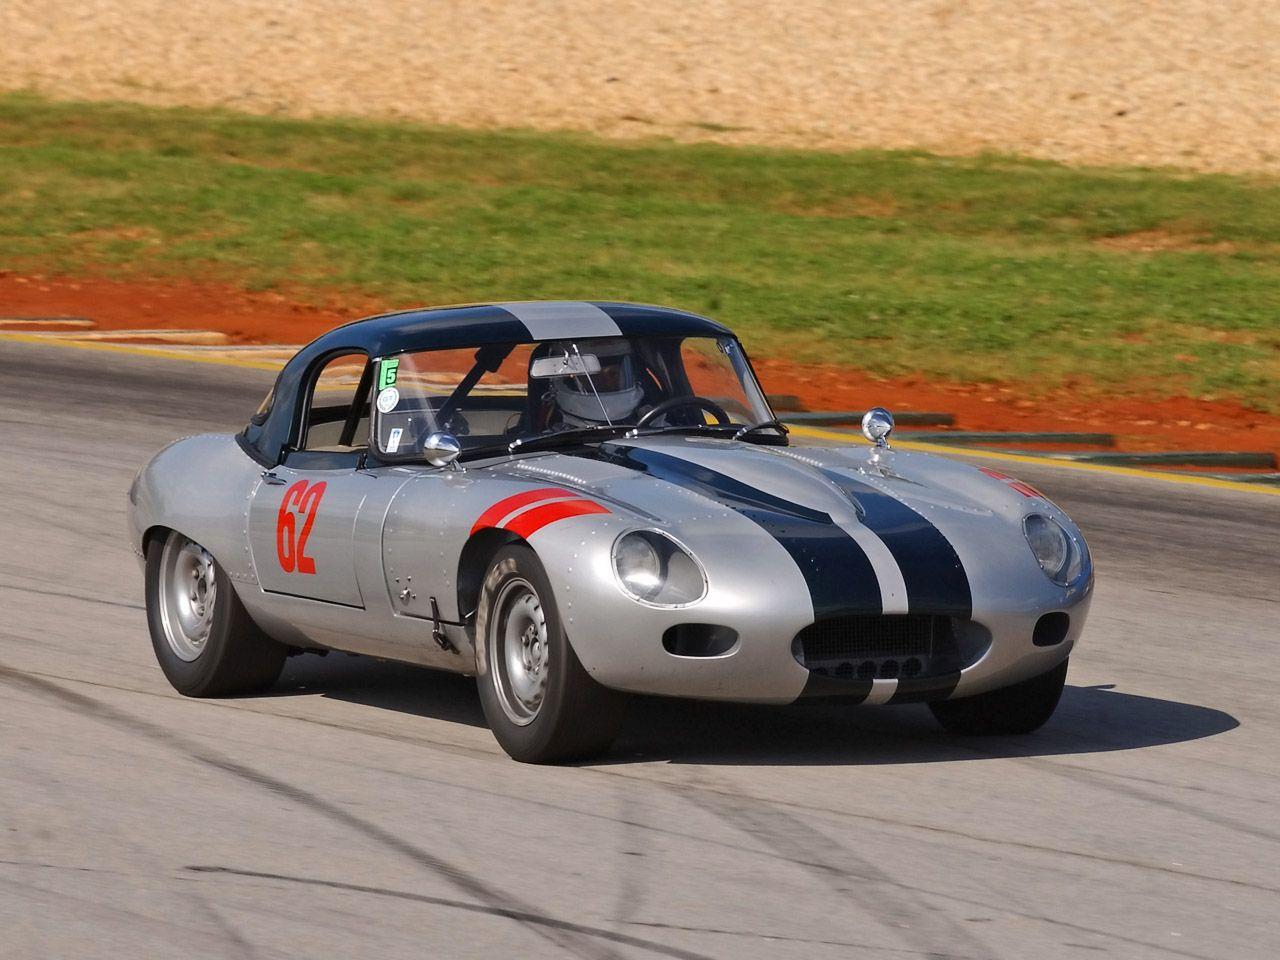 1962 Jaguar E-Type Roadster Race Car